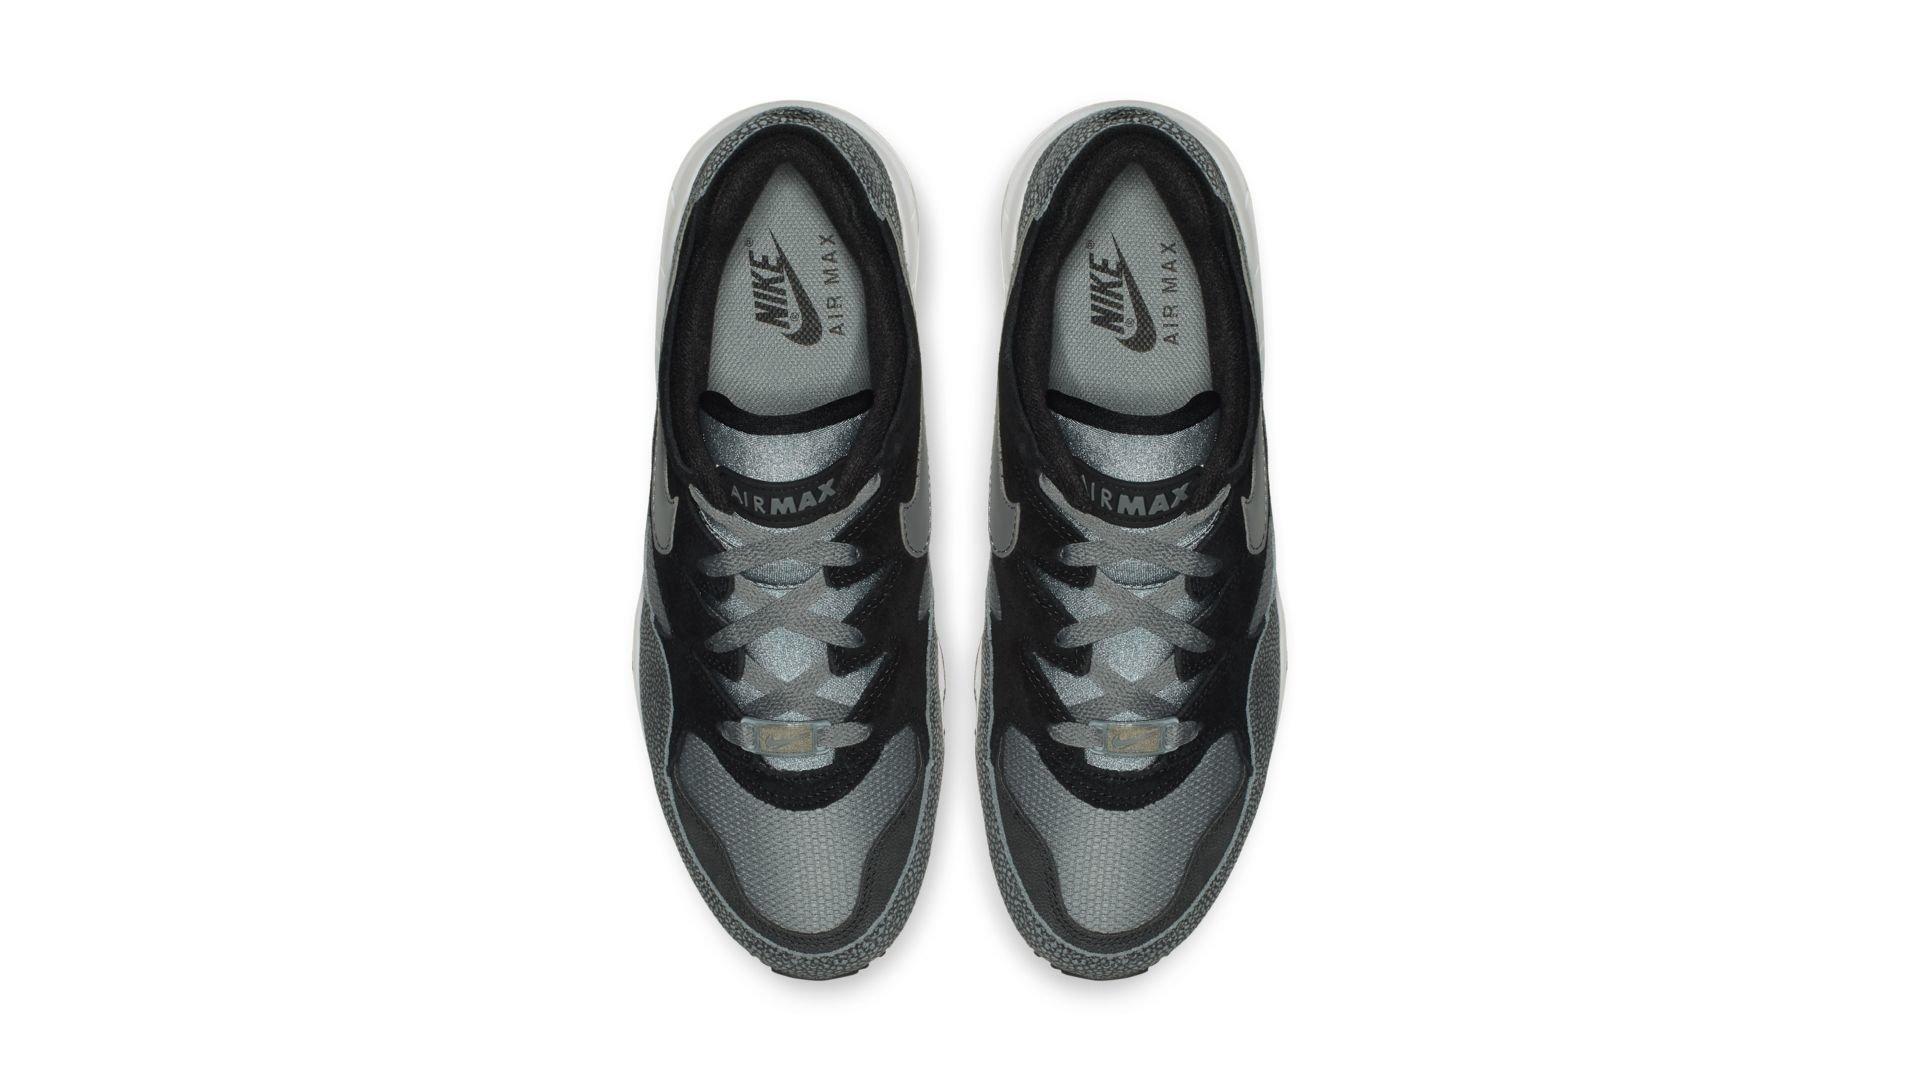 Nike Air Max 94 Black Grey Safari (AV8197-001)